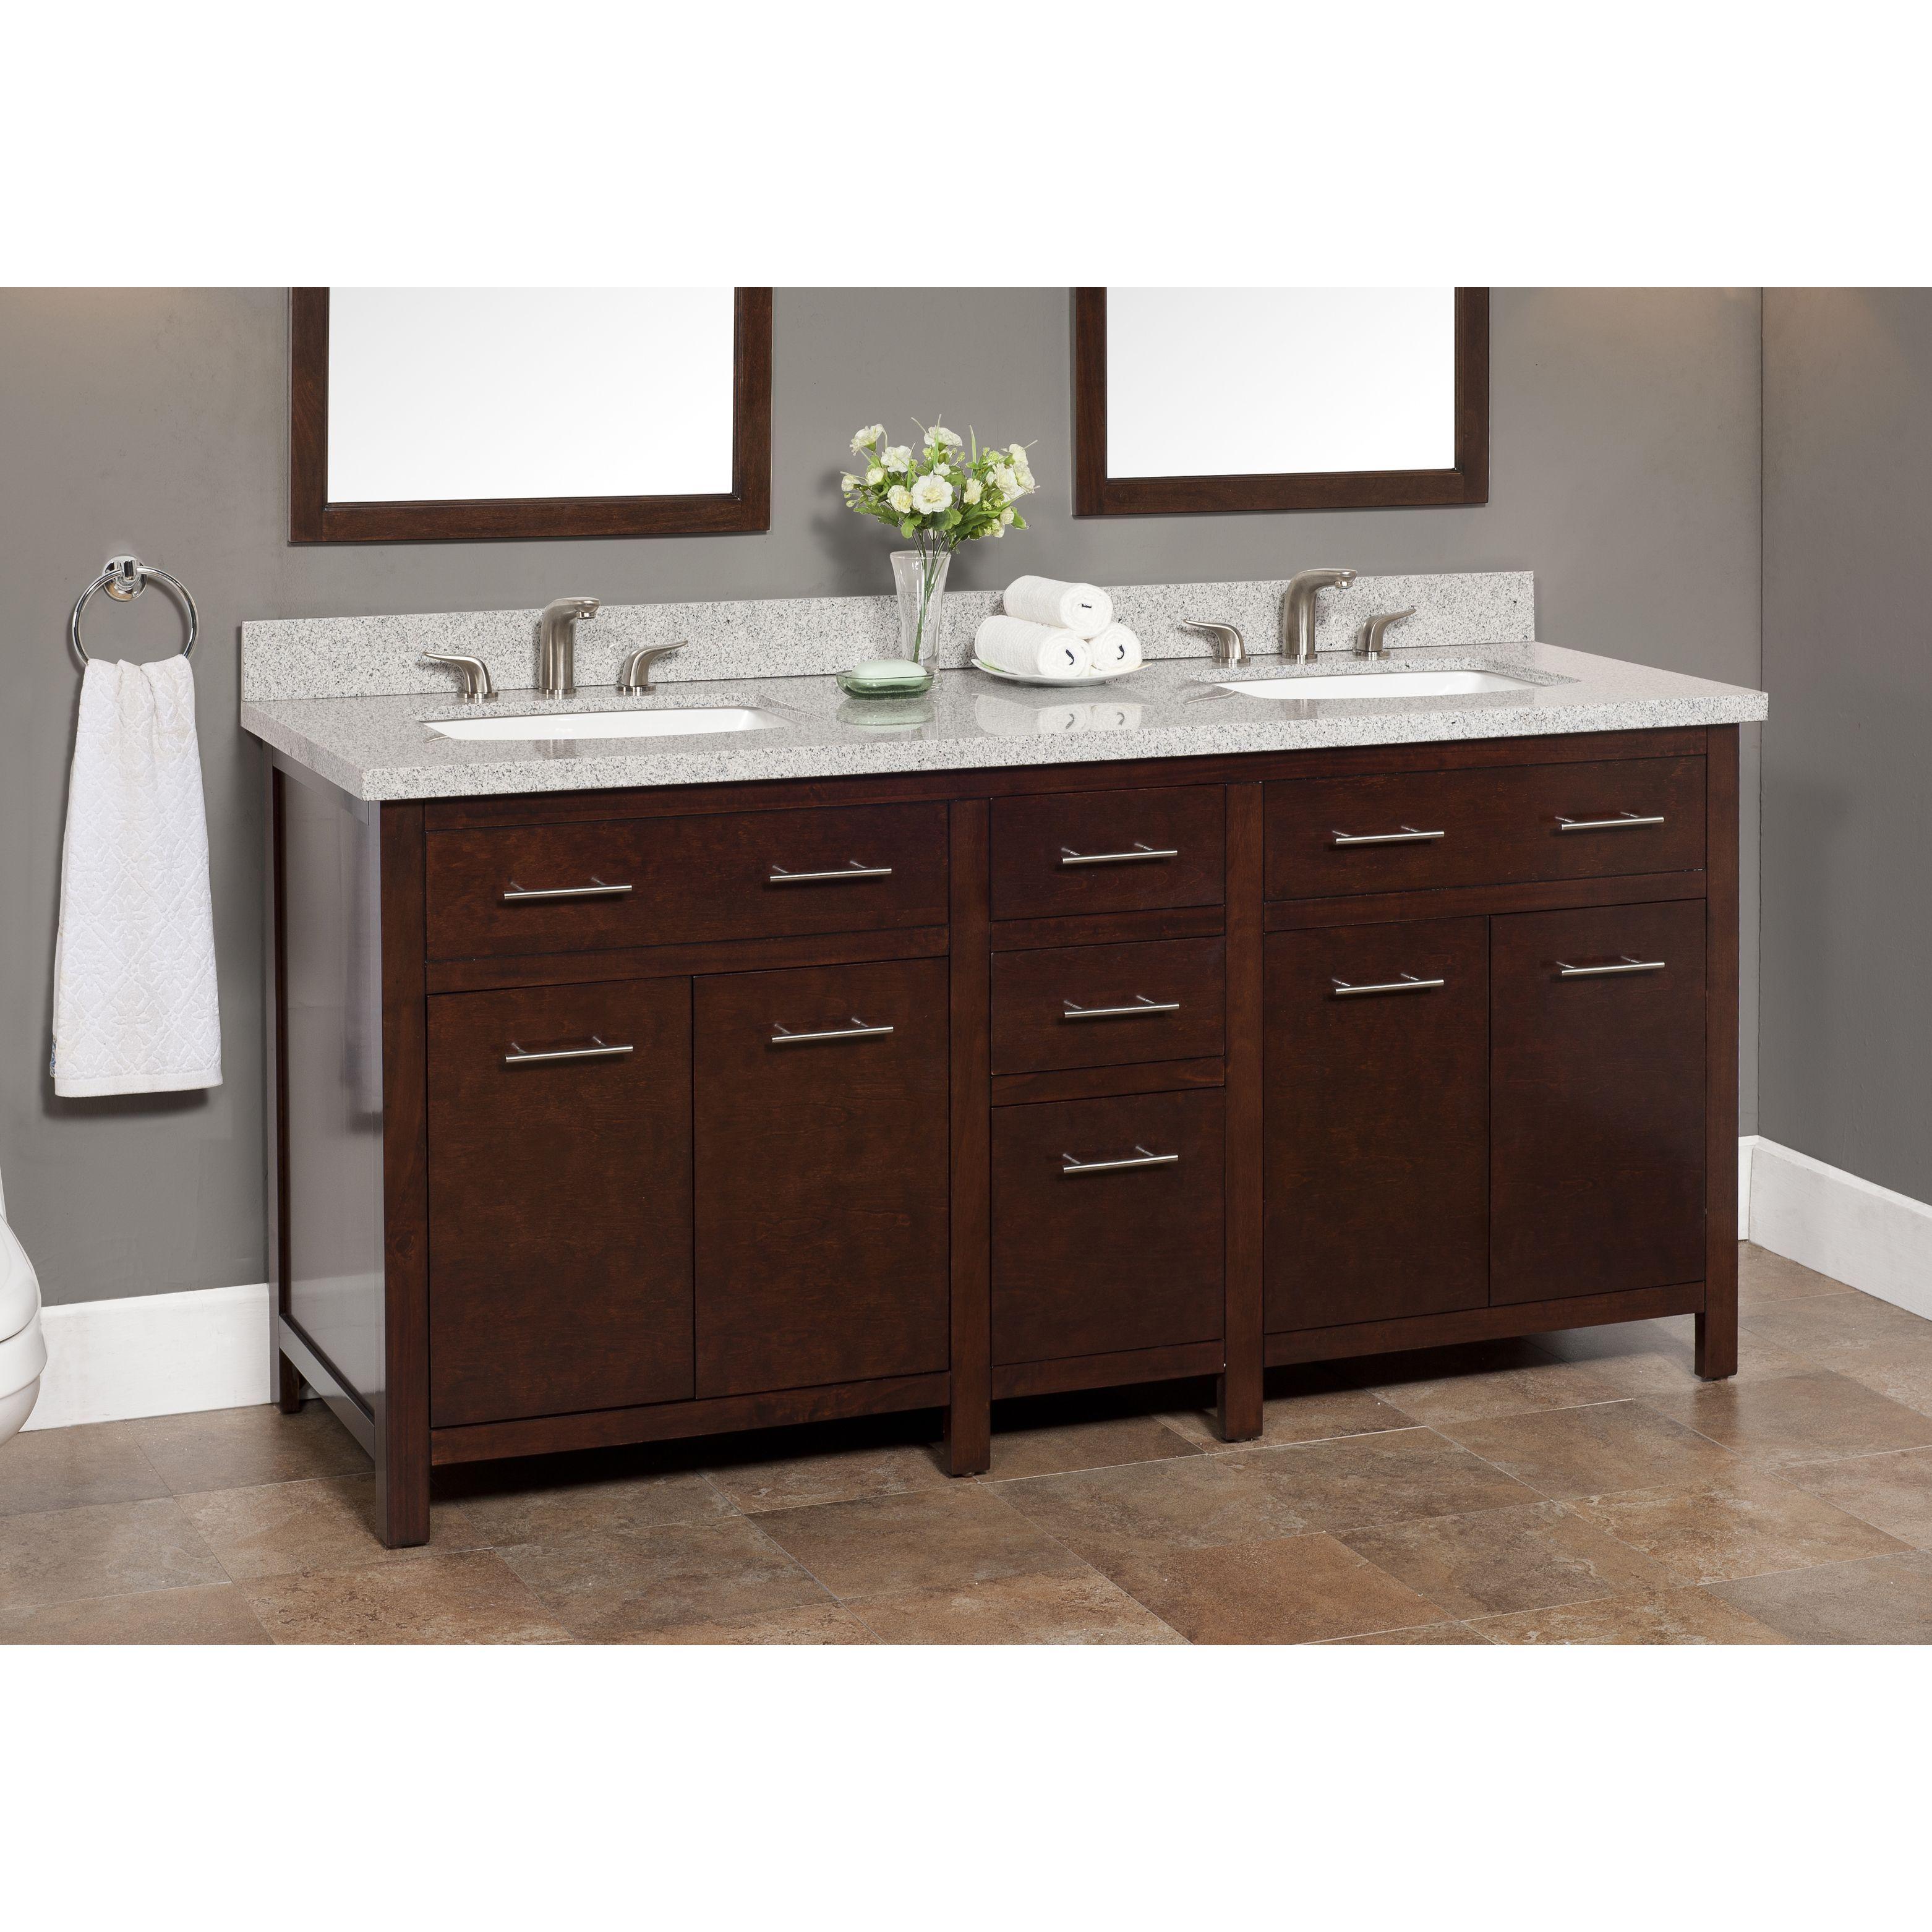 Blanco 72 Inch Granite Double Sink Vanity With Backsplash